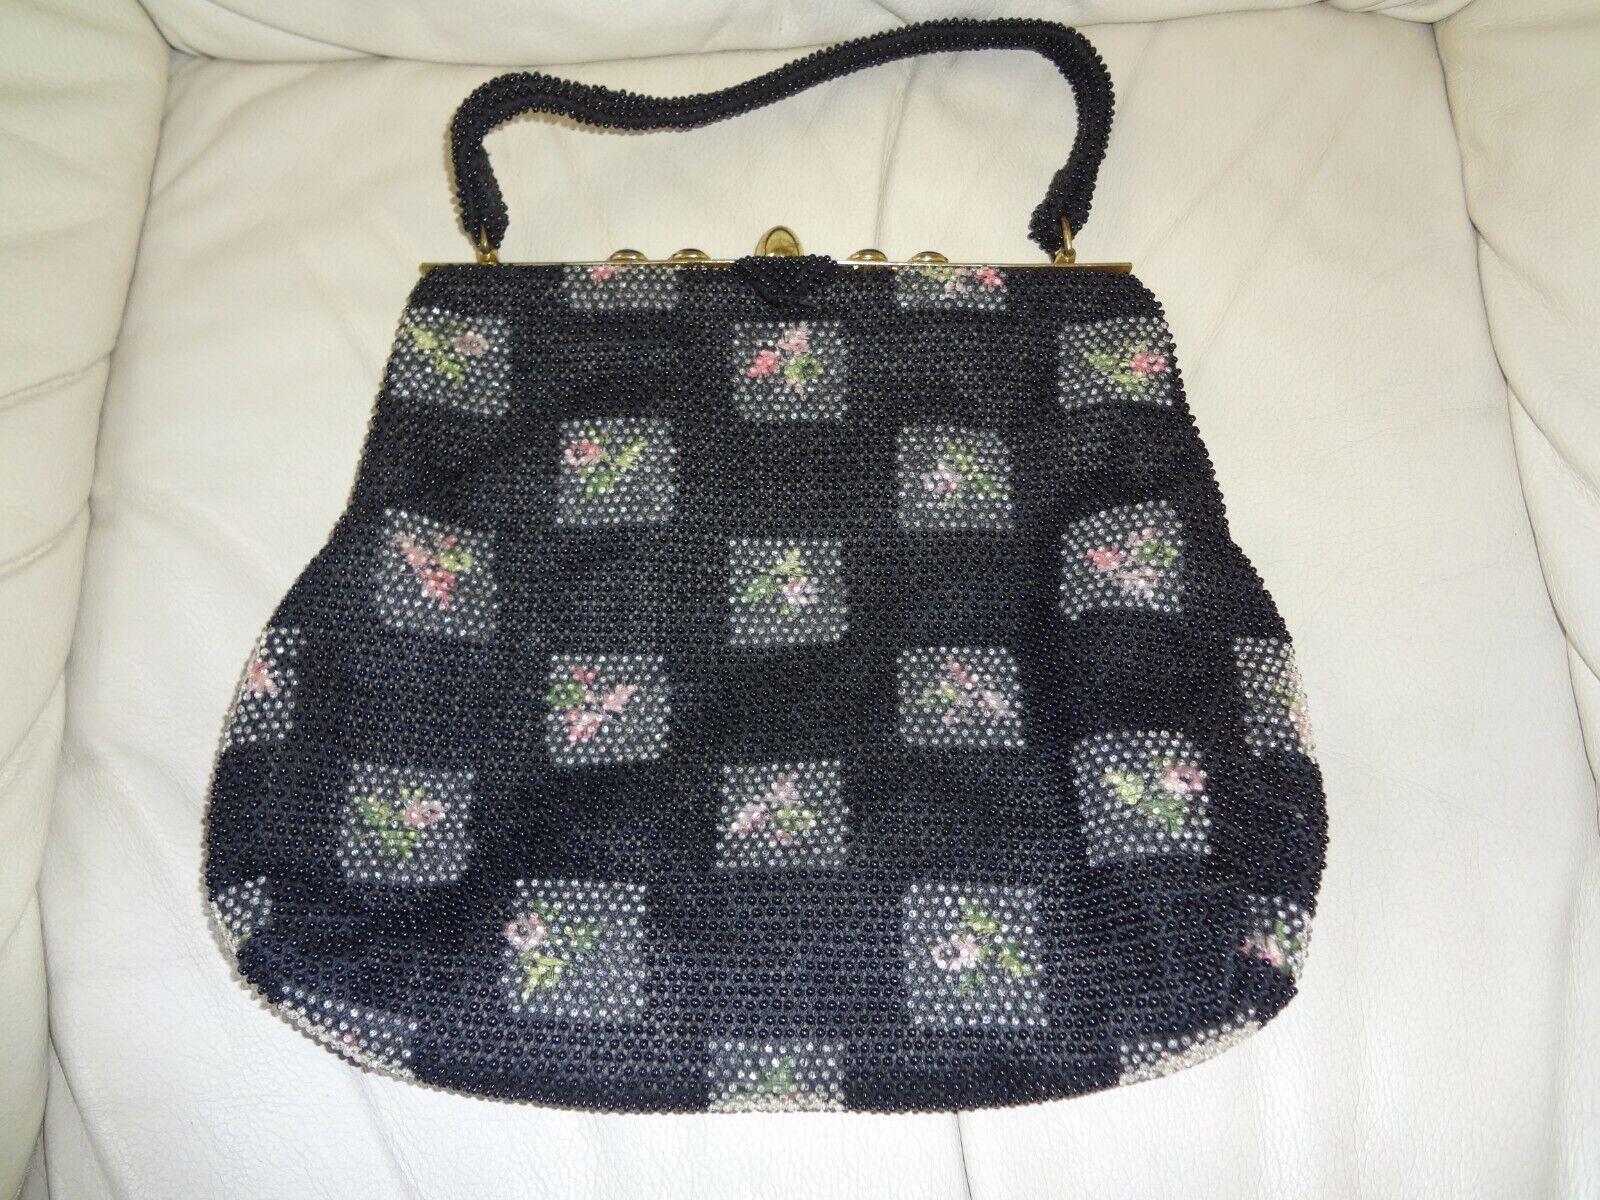 VTG From 1960's Lumured Black Petite Bead Corde Handbag Purse & Coin Wallet